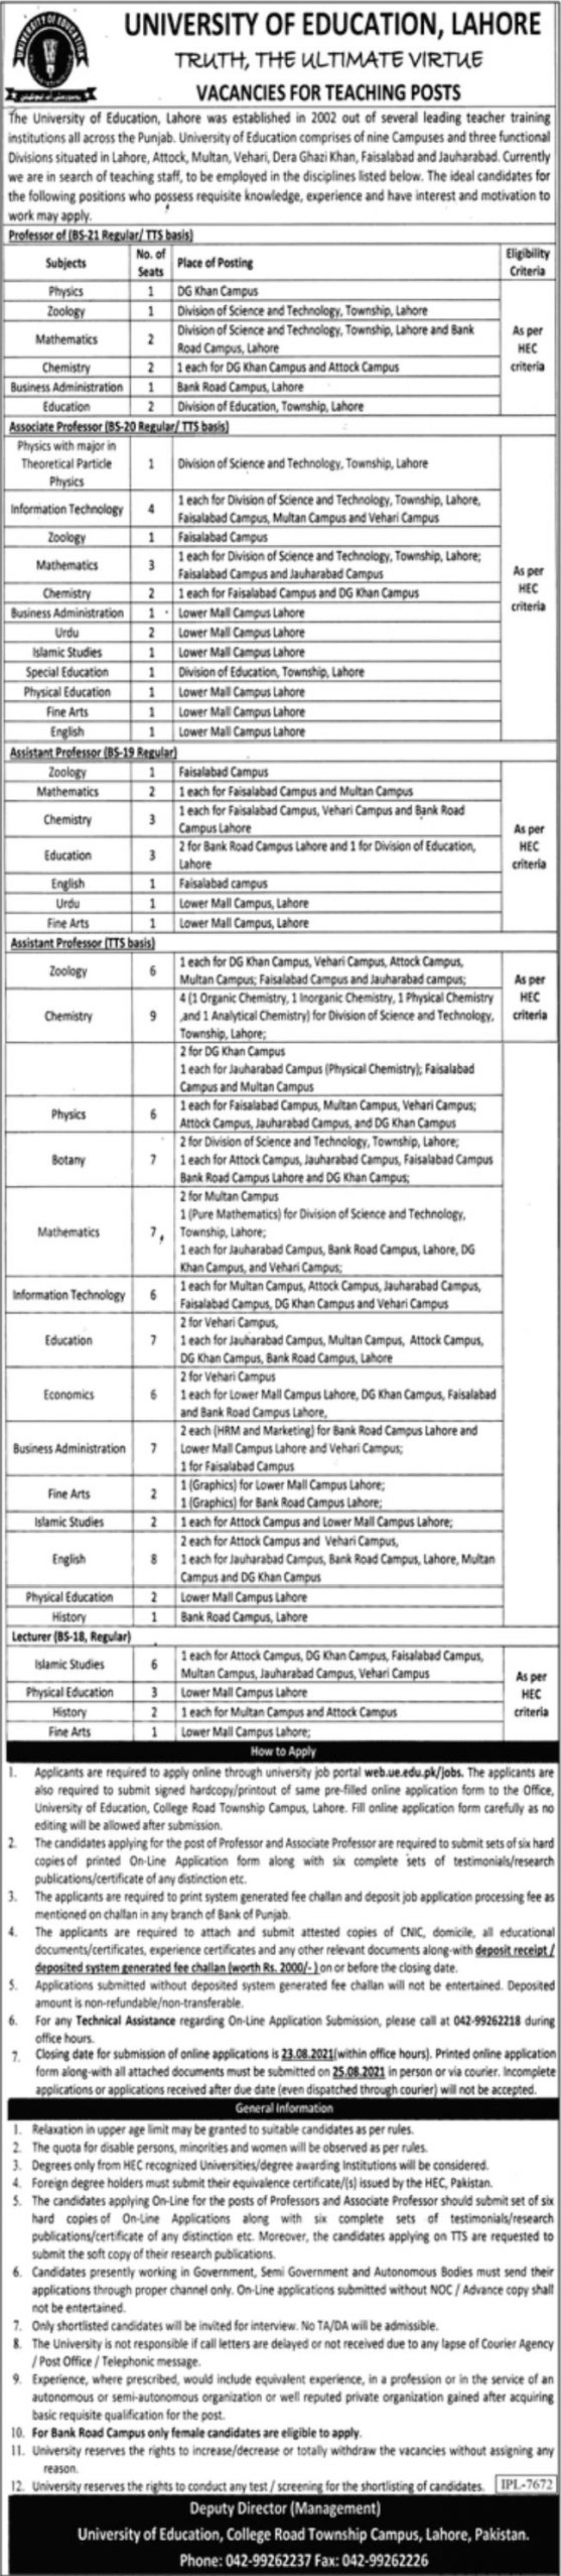 University of Education Lahore Vacancies 2021 1